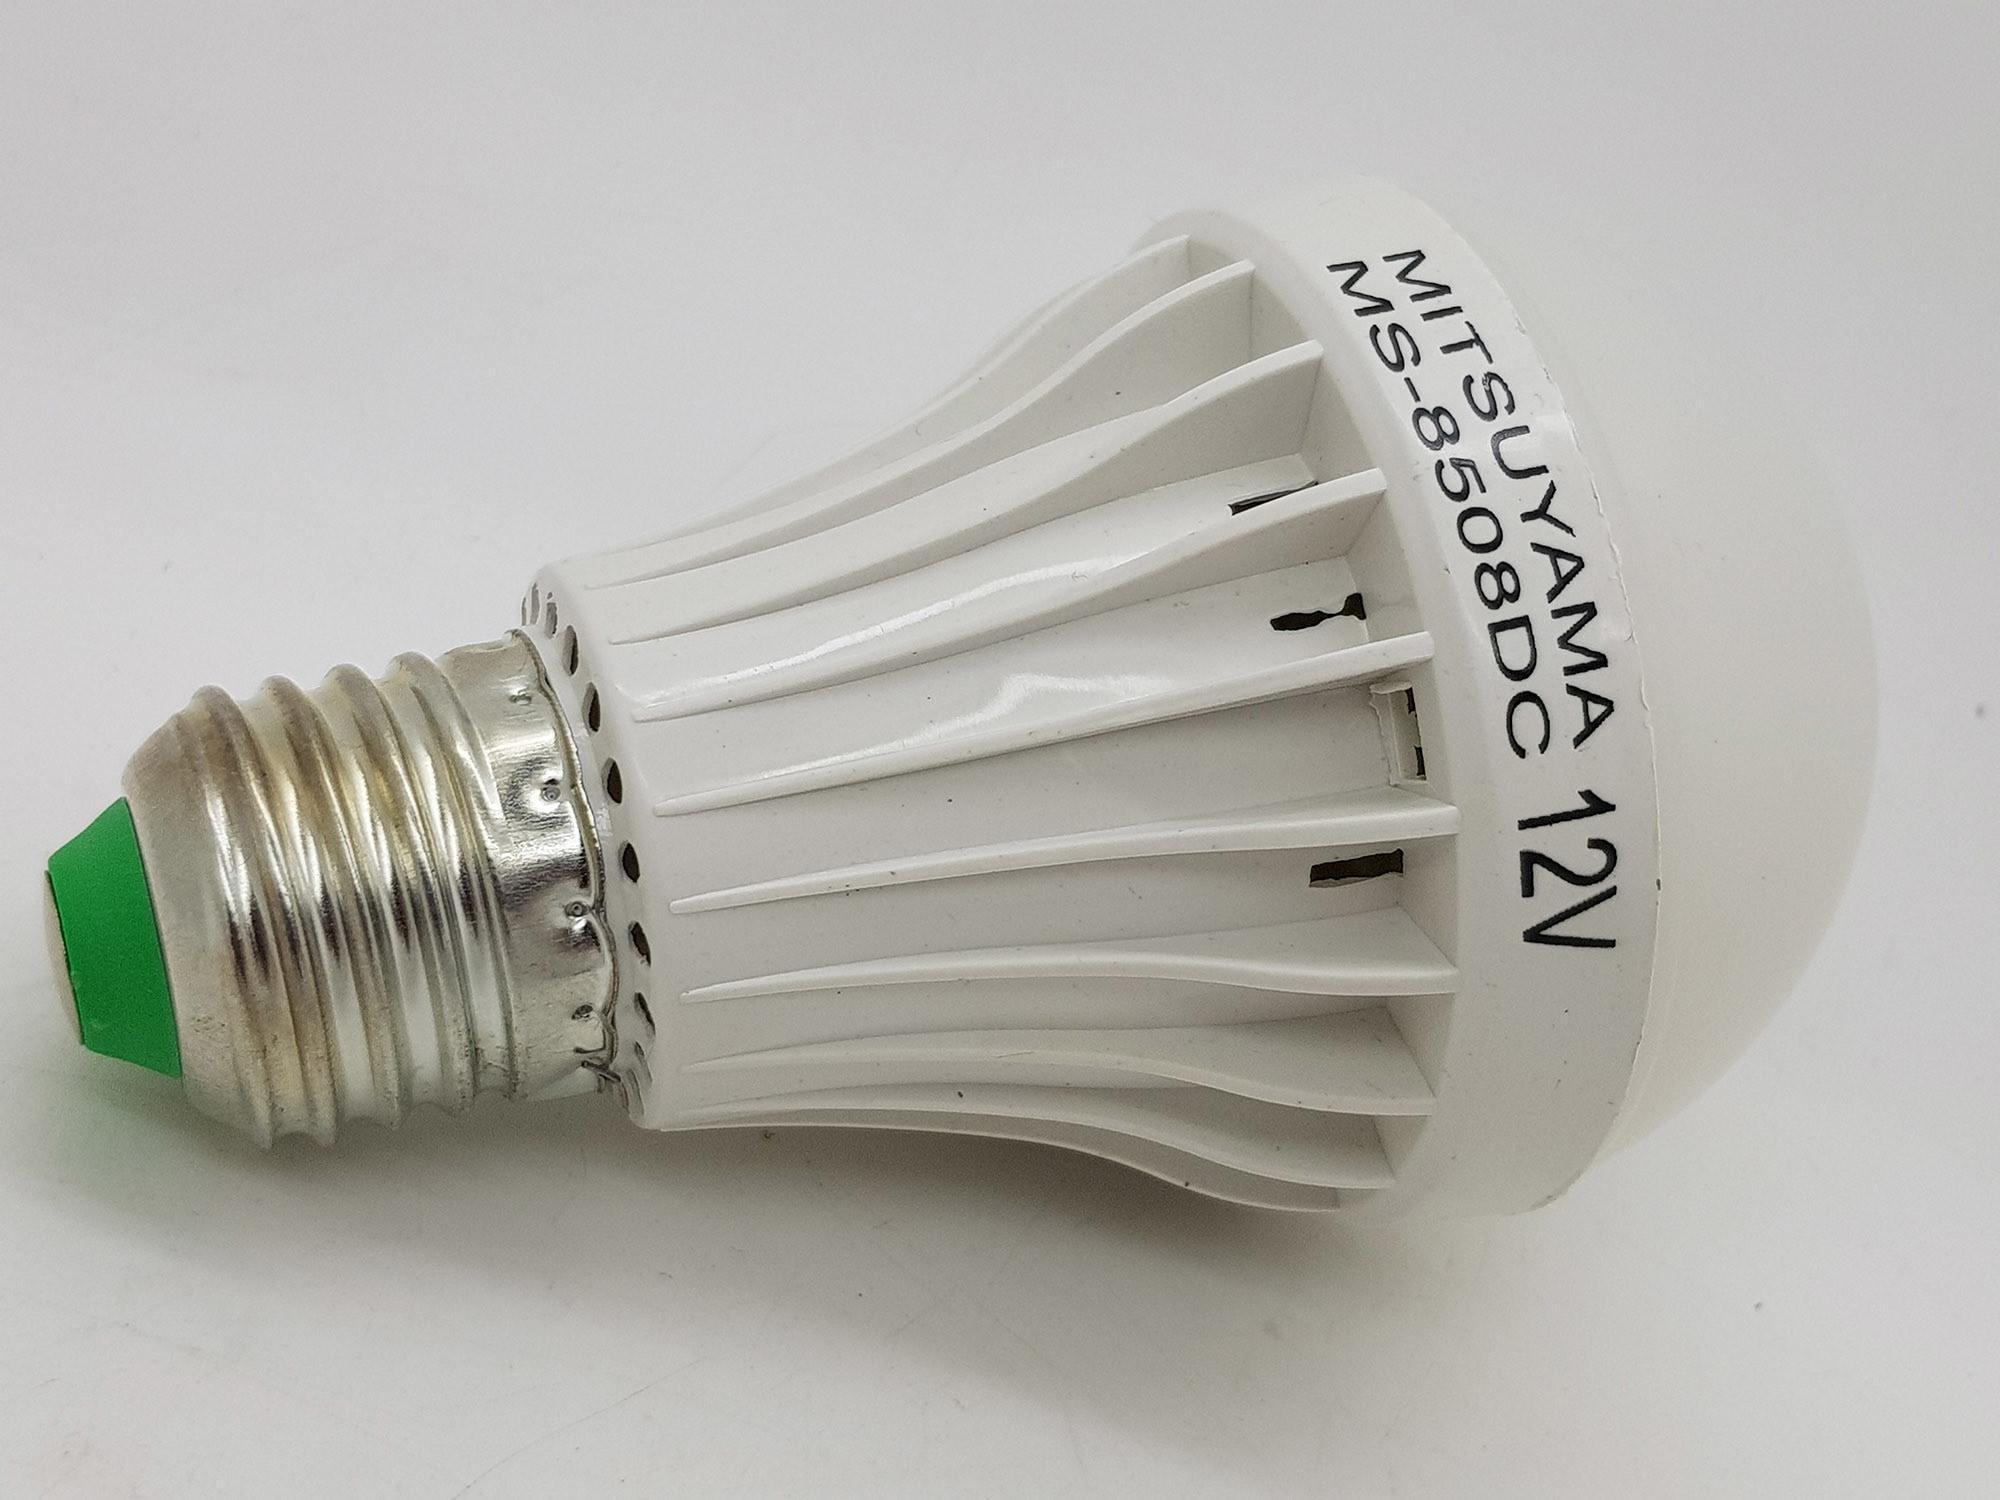 Fitur Merk Mitsuyama 8w E27 Lampu Led 12v Dc Solar Cell 15w Bohlam Aki Emergency 4